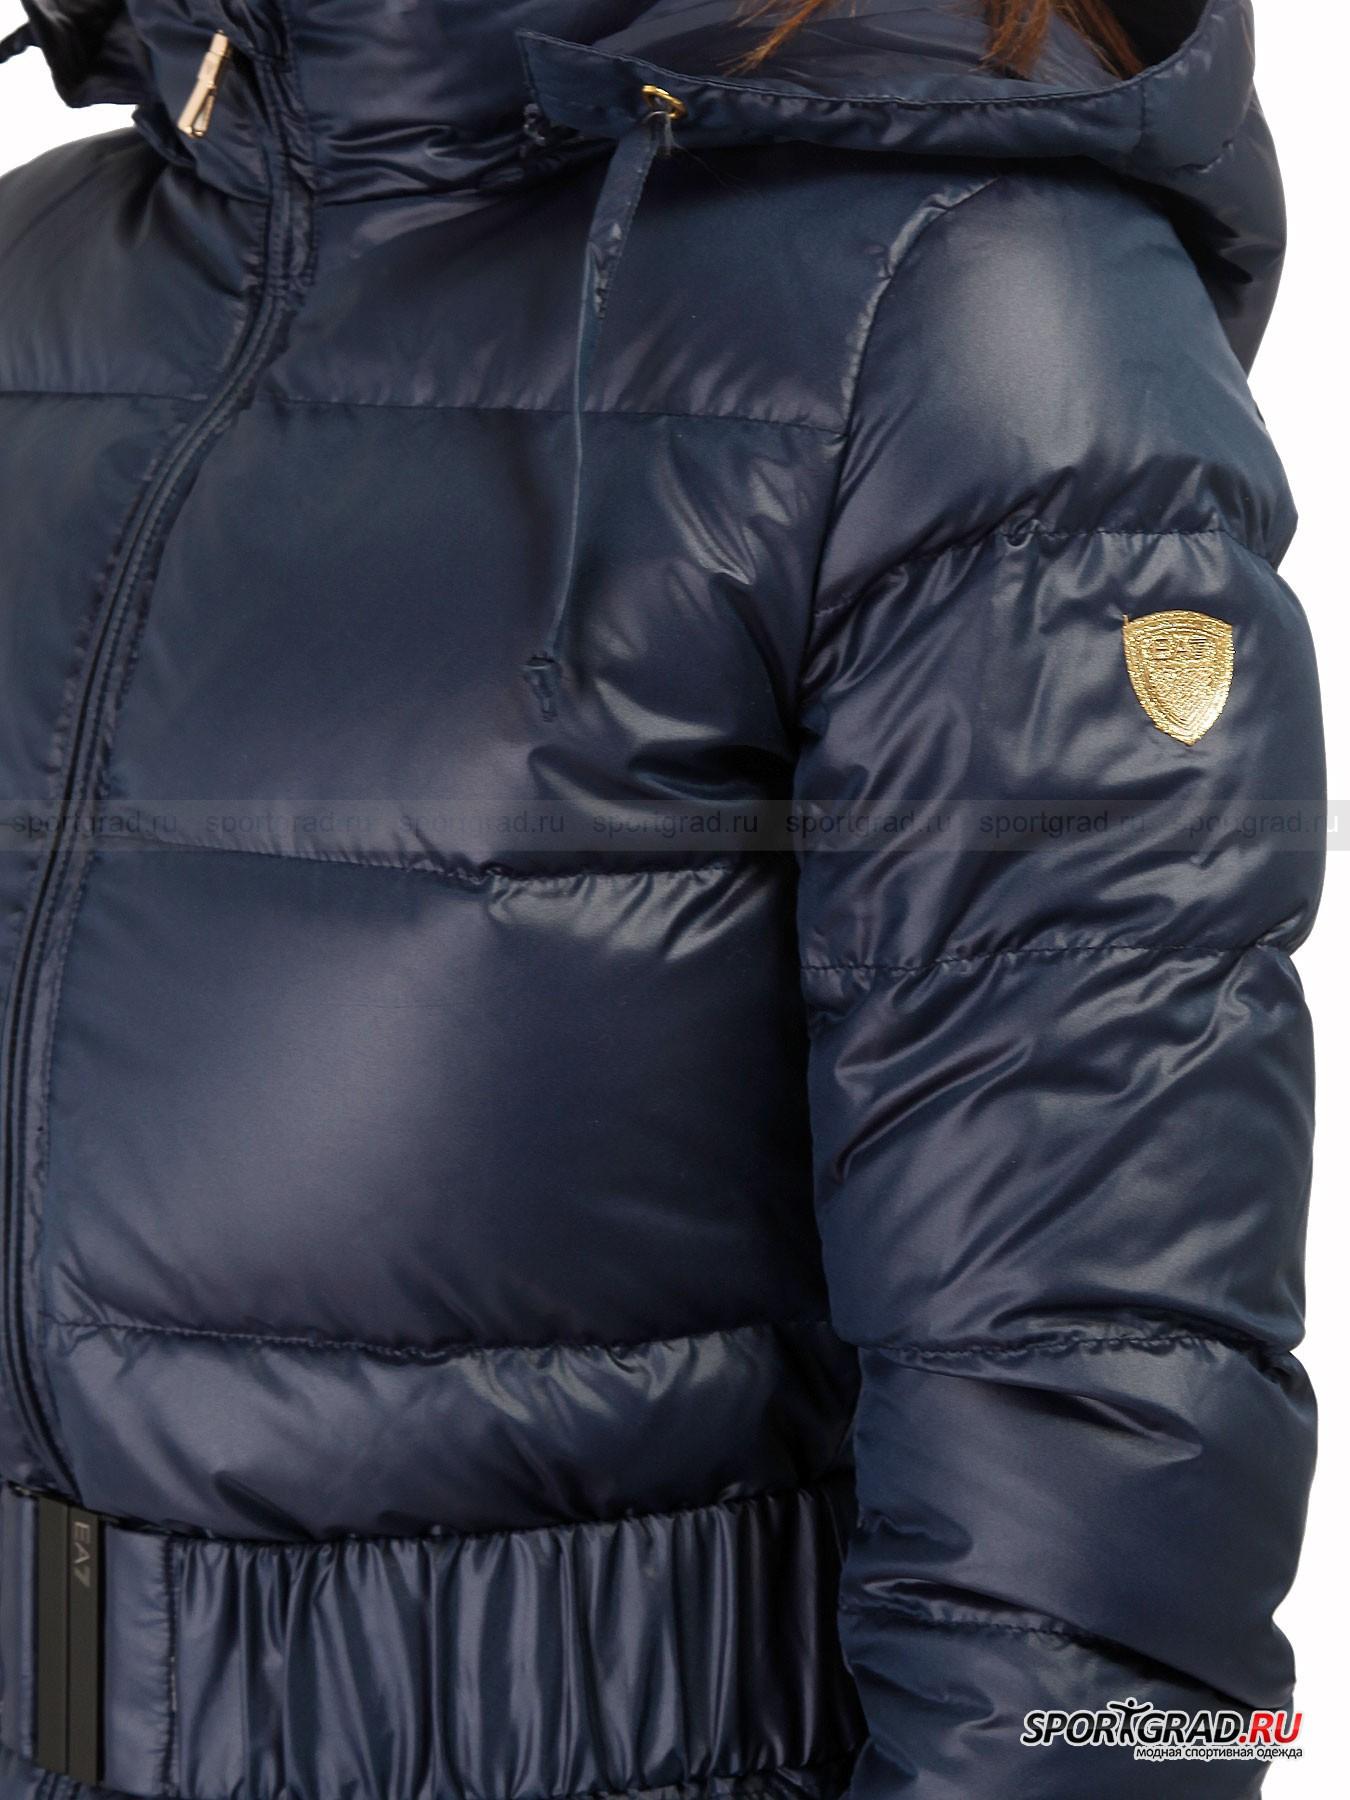 Пальто пуховое Mountain Pure Down Jacket EA7 EMPORIO ARMANI от Спортград